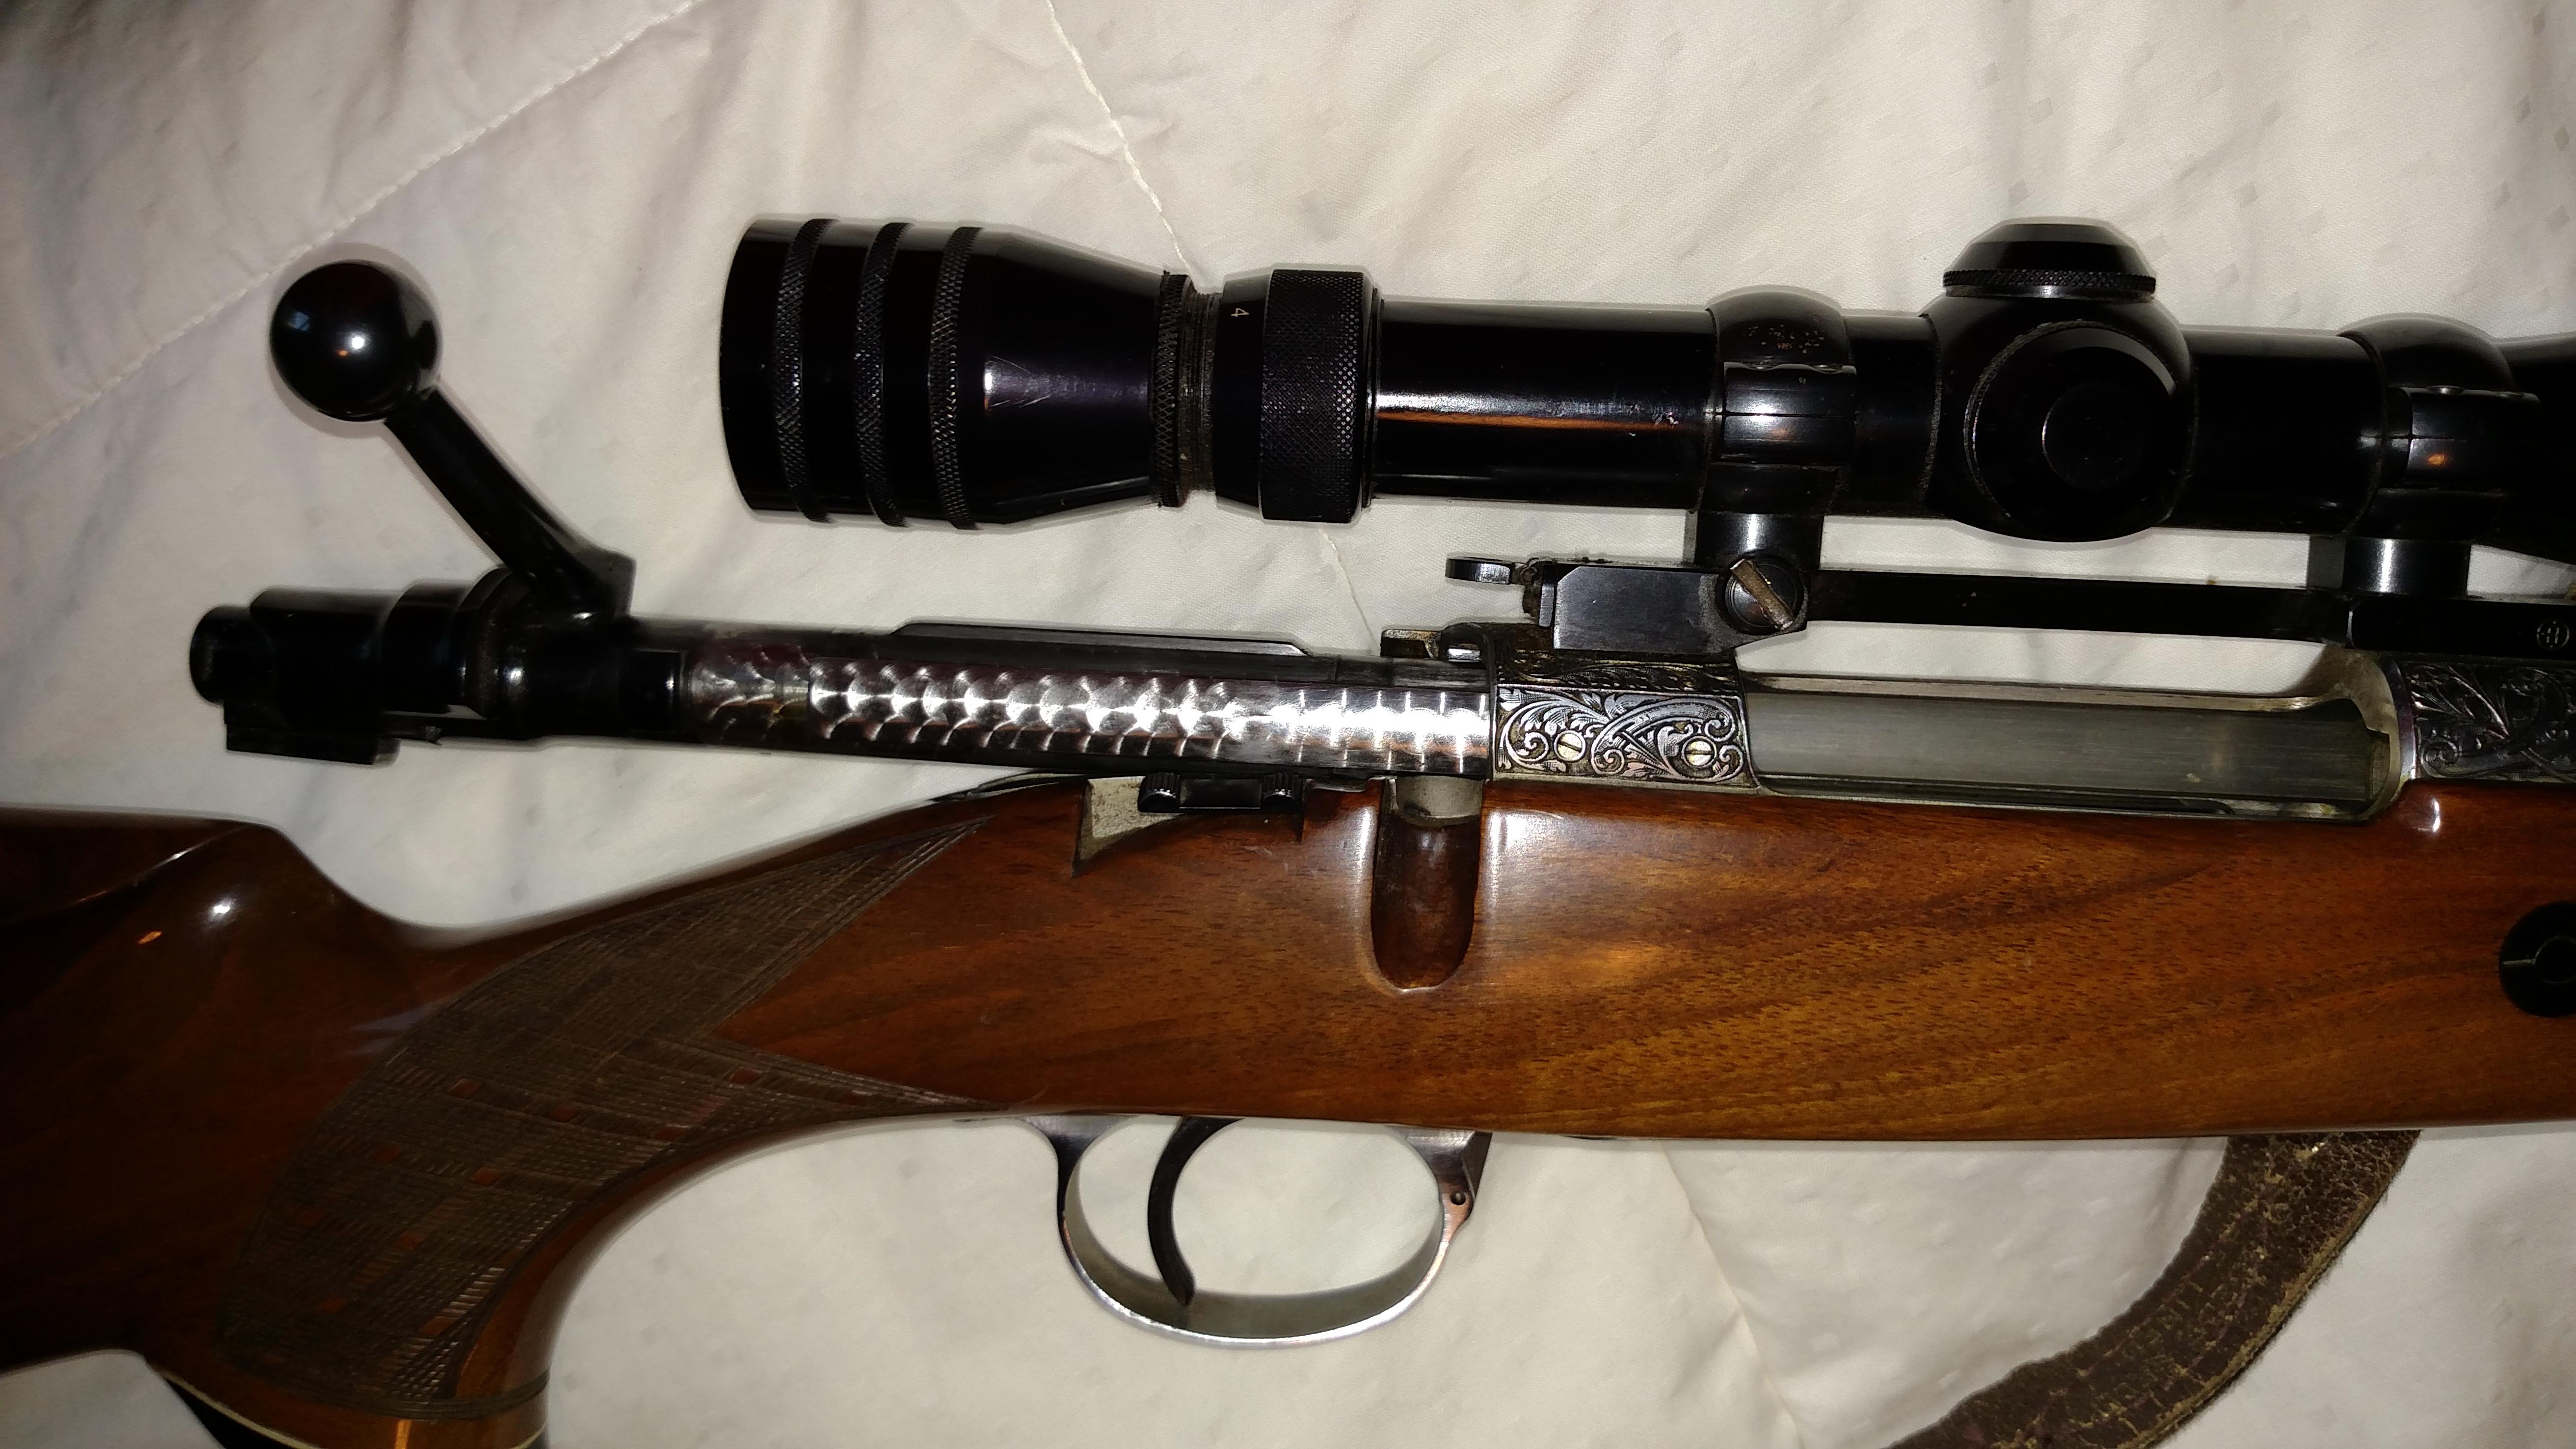 15-07-07_rifle 6.jpg